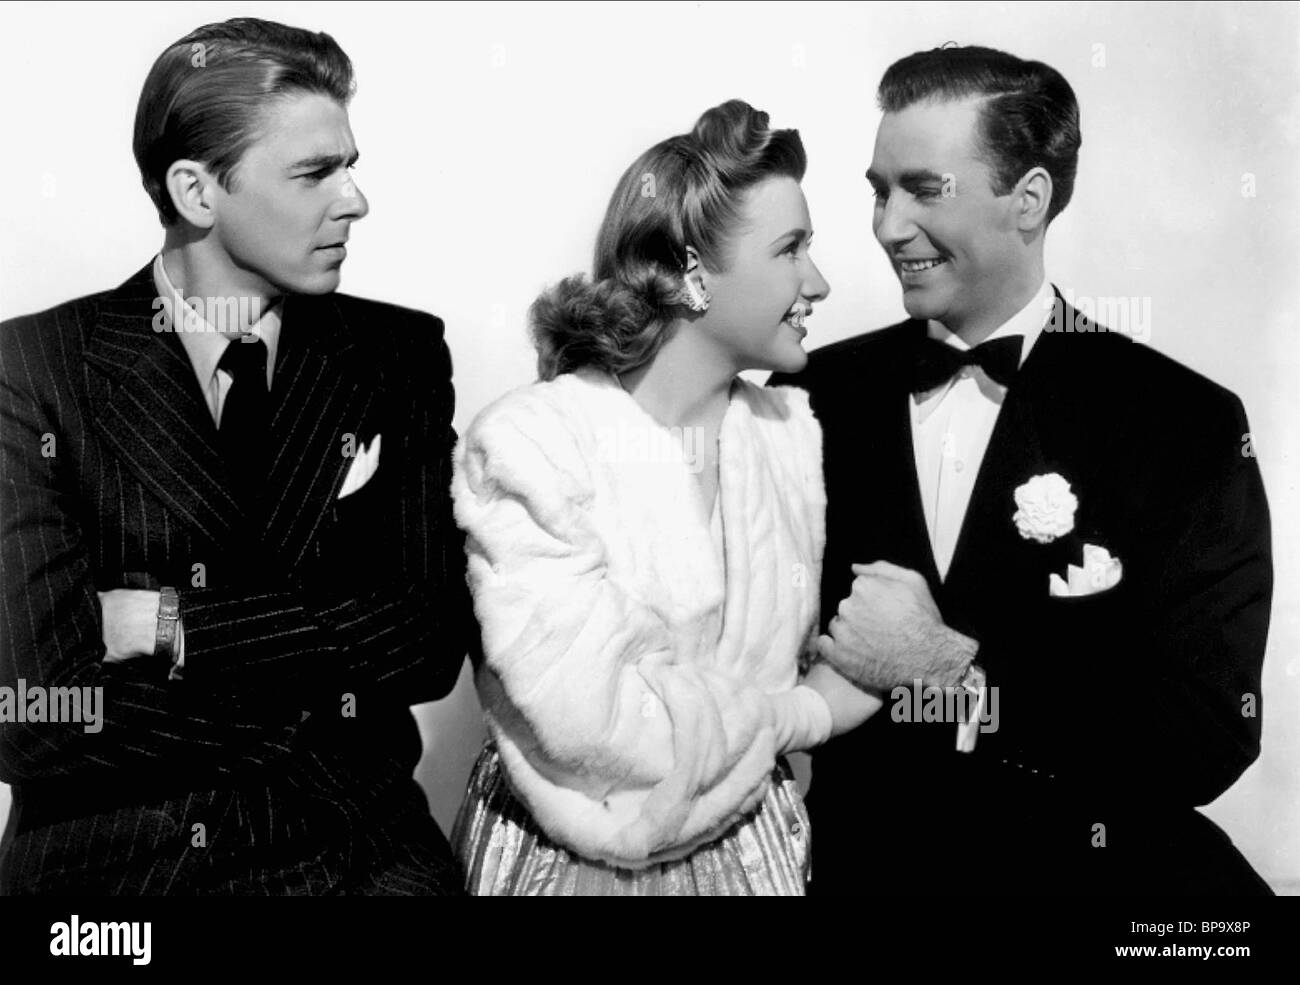 RONALD REAGAN PRISCILLA LANE JEFFREY LYNN MILLION DOLLAR BABY (1941) - Stock Image